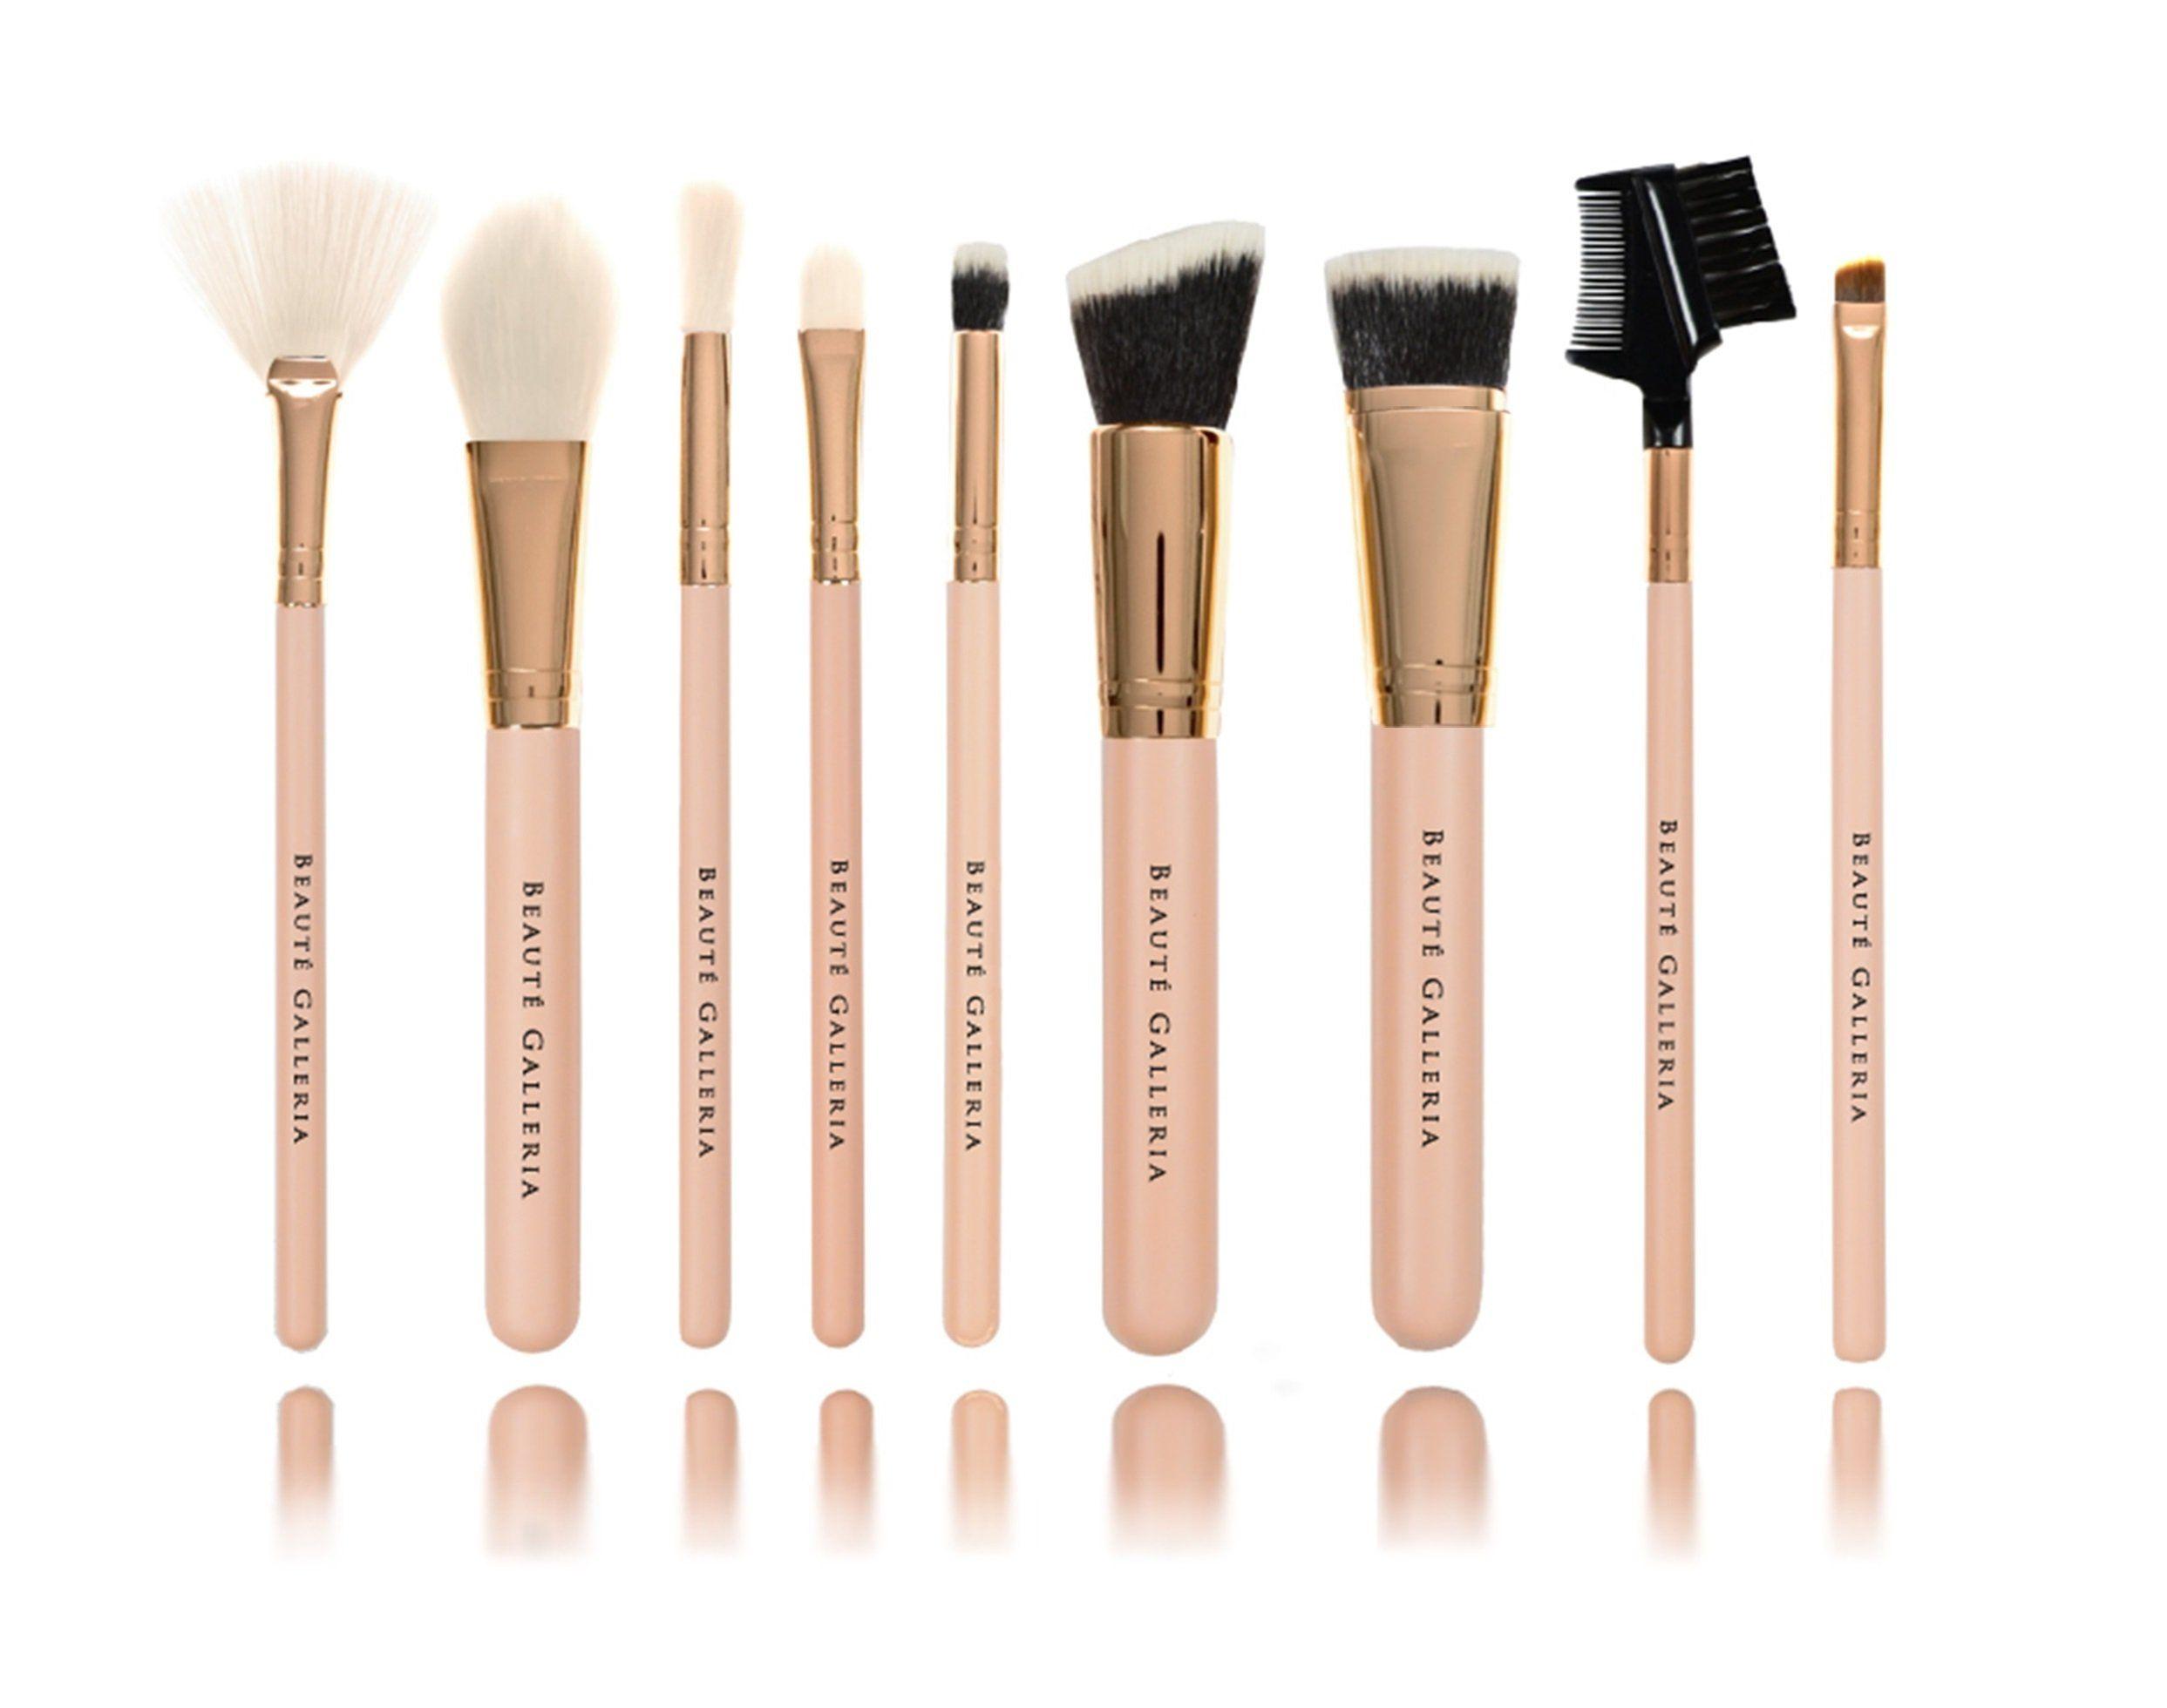 Beaute Galleria 9pcs Makeup Brush Set with Cosmetic Bag